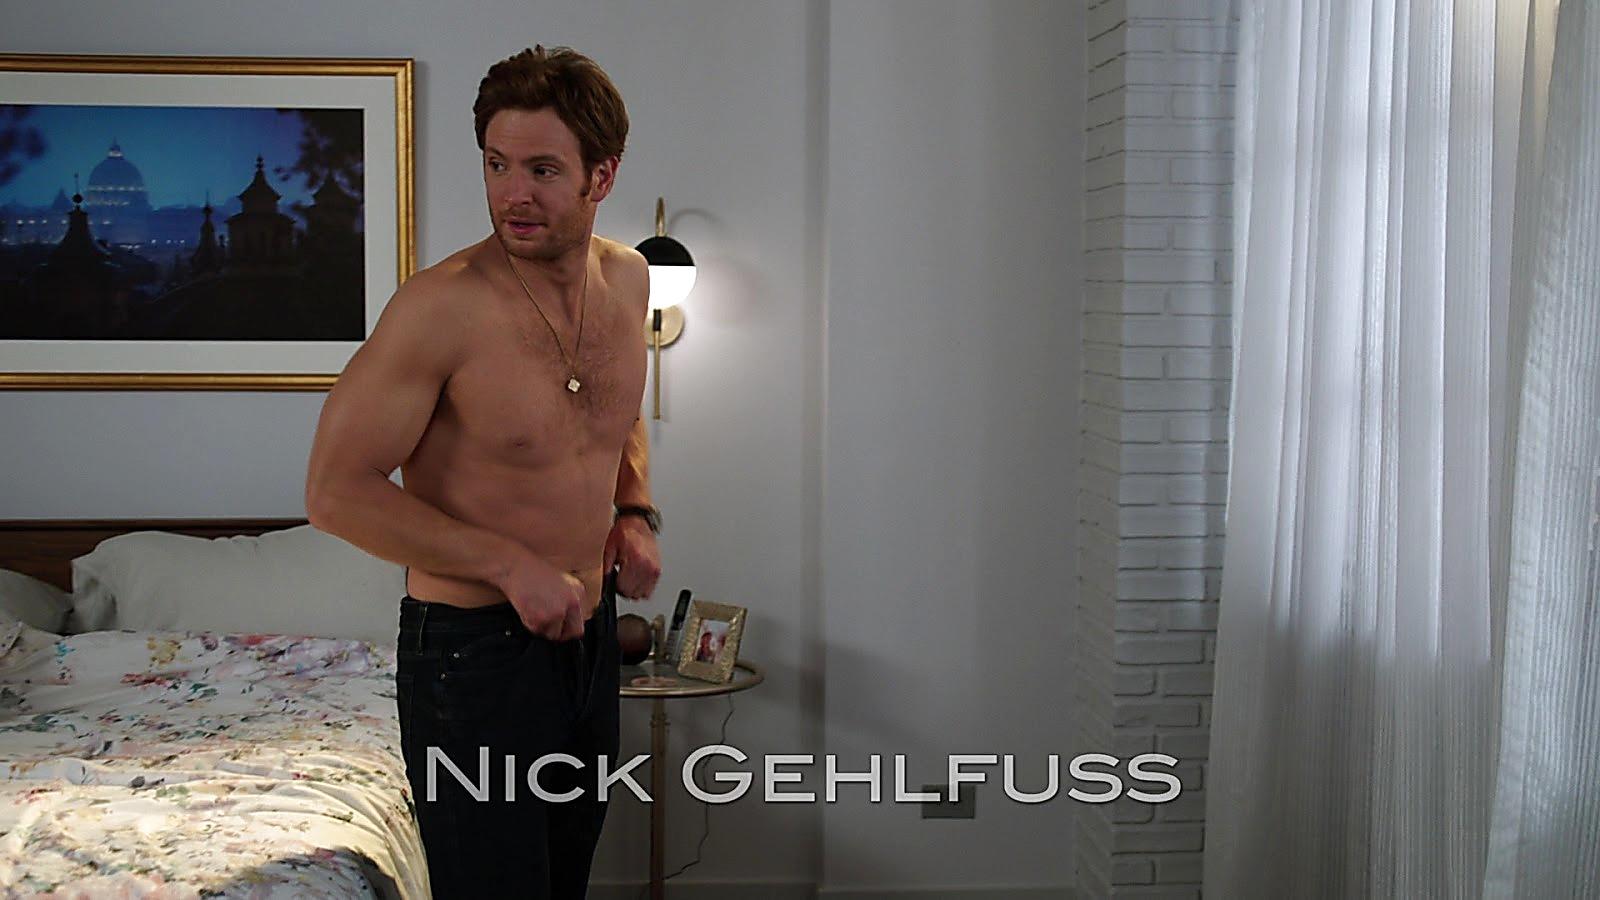 Nick Gehlfuss sexy shirtless scene April 13, 2020, 12pm